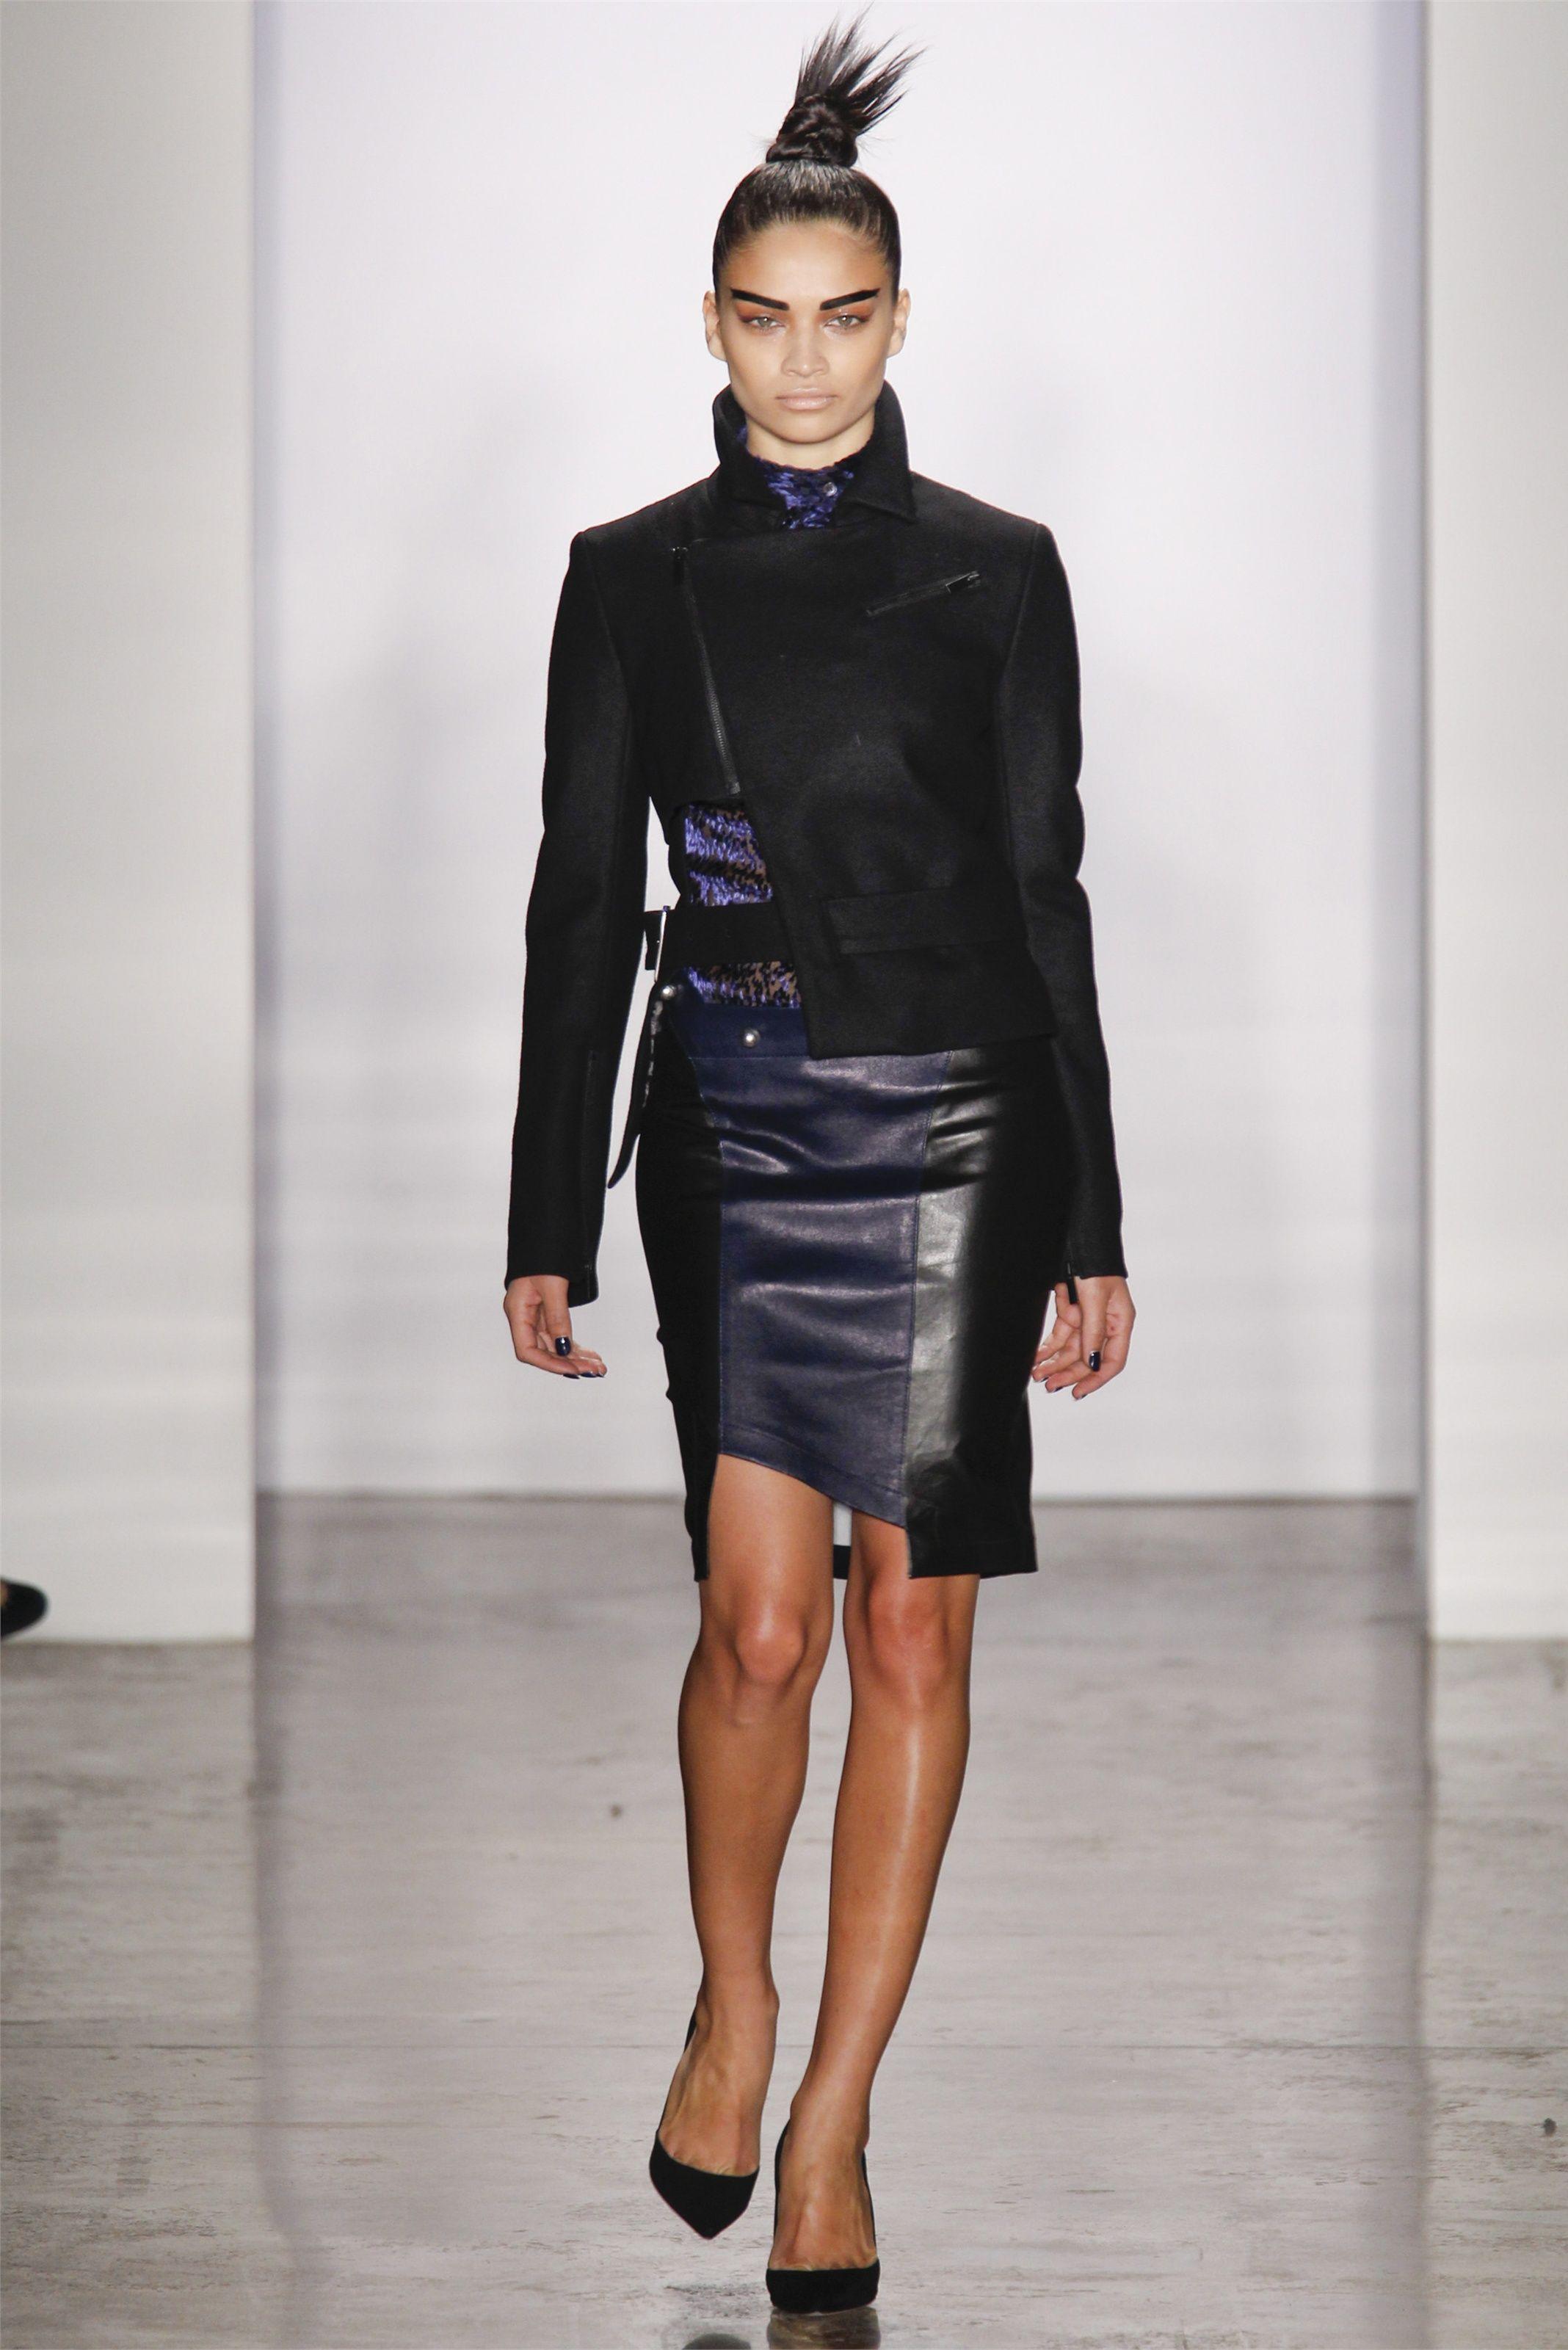 Asymmetrical wool jacket with a peep of a print @ Kevork Kiledjian FW12